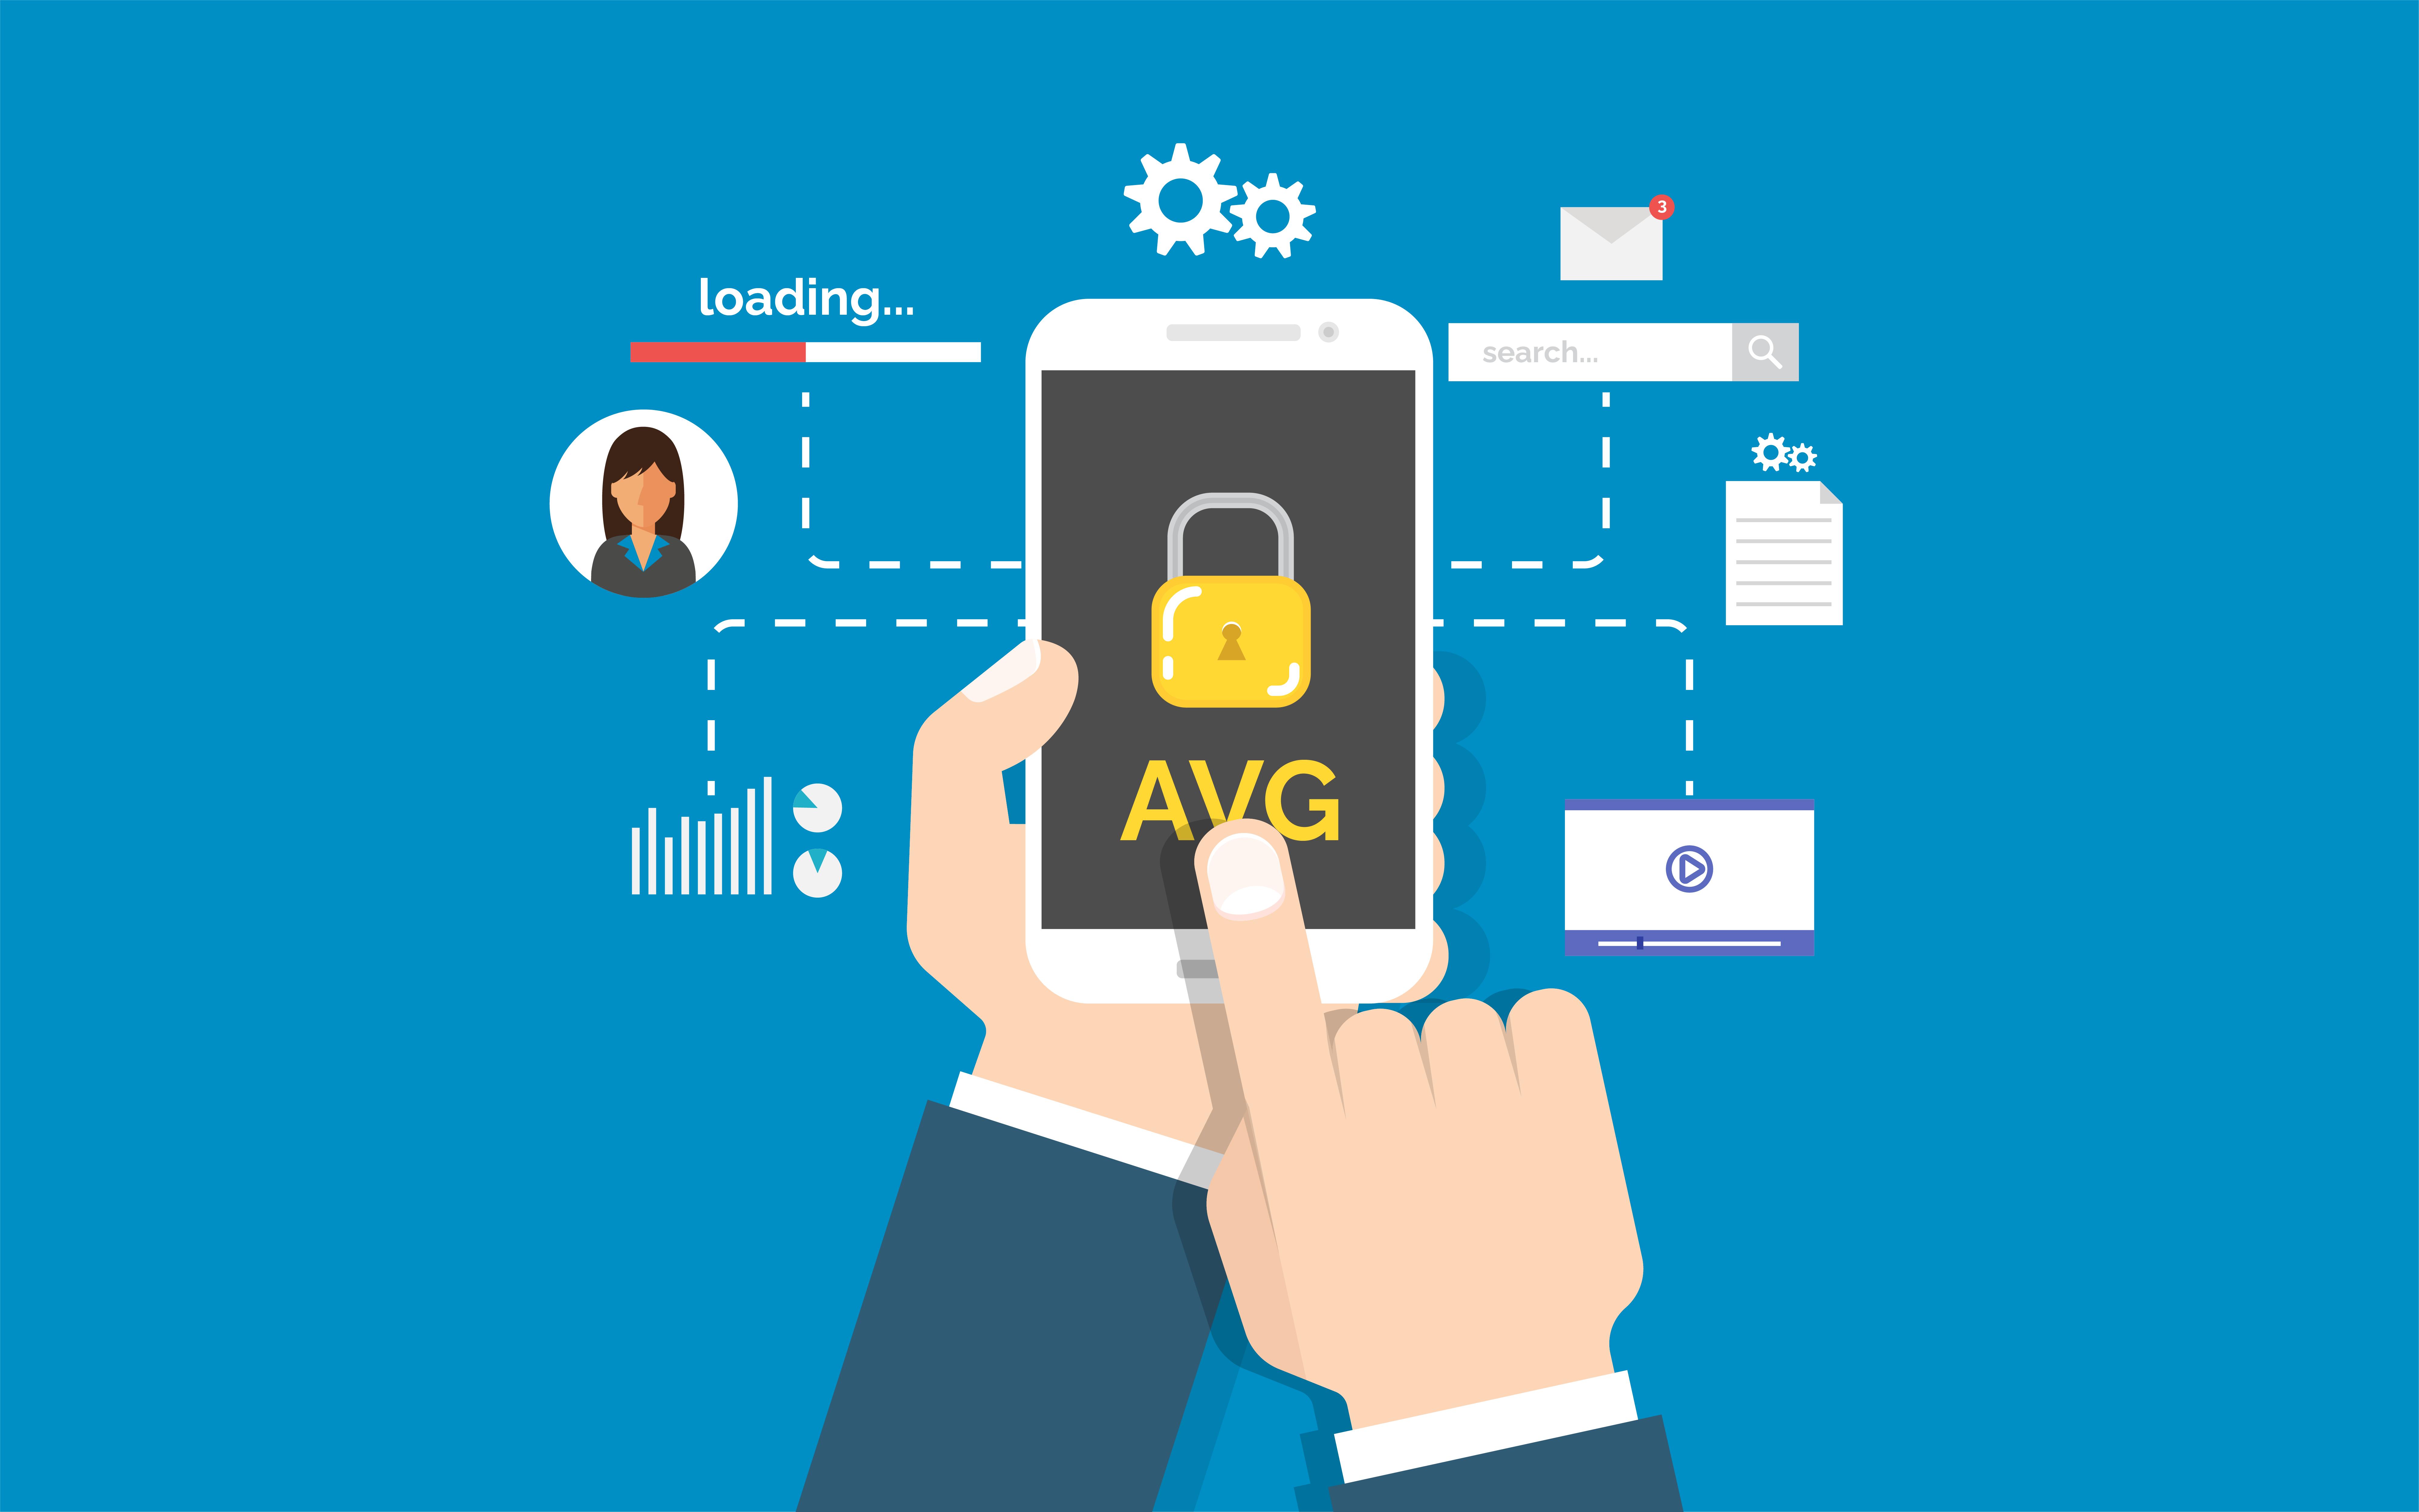 AVG checklist